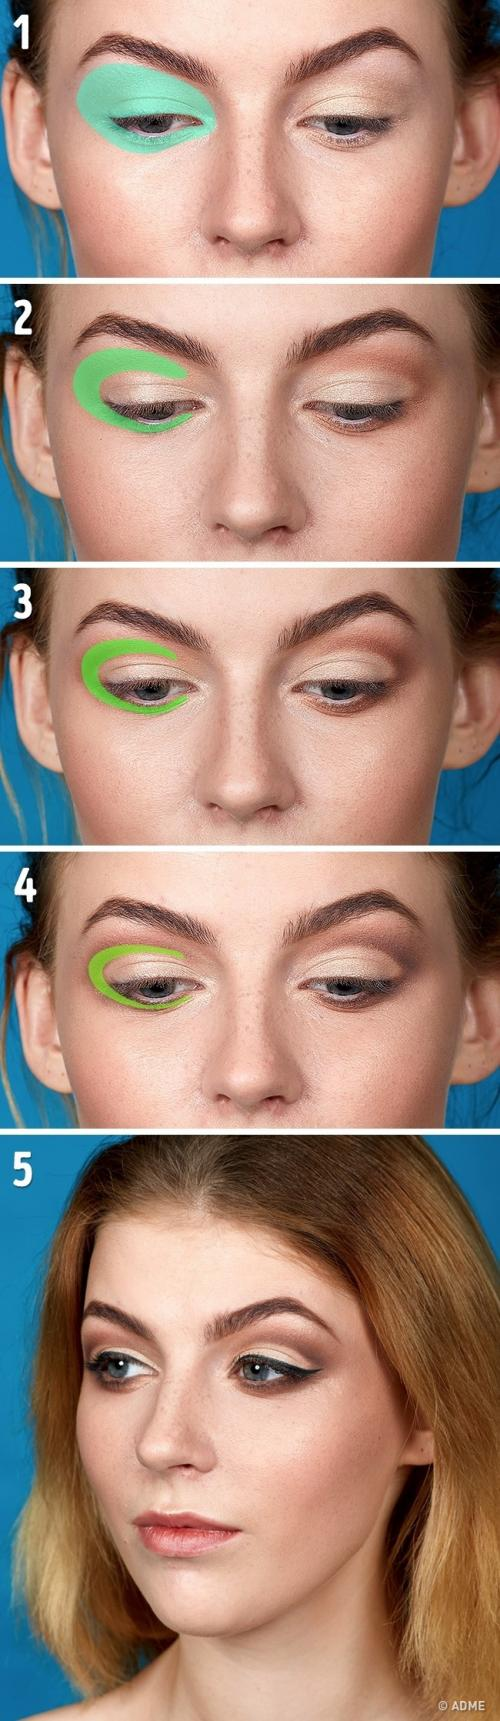 Техника визажа лица. Вертикальная техника